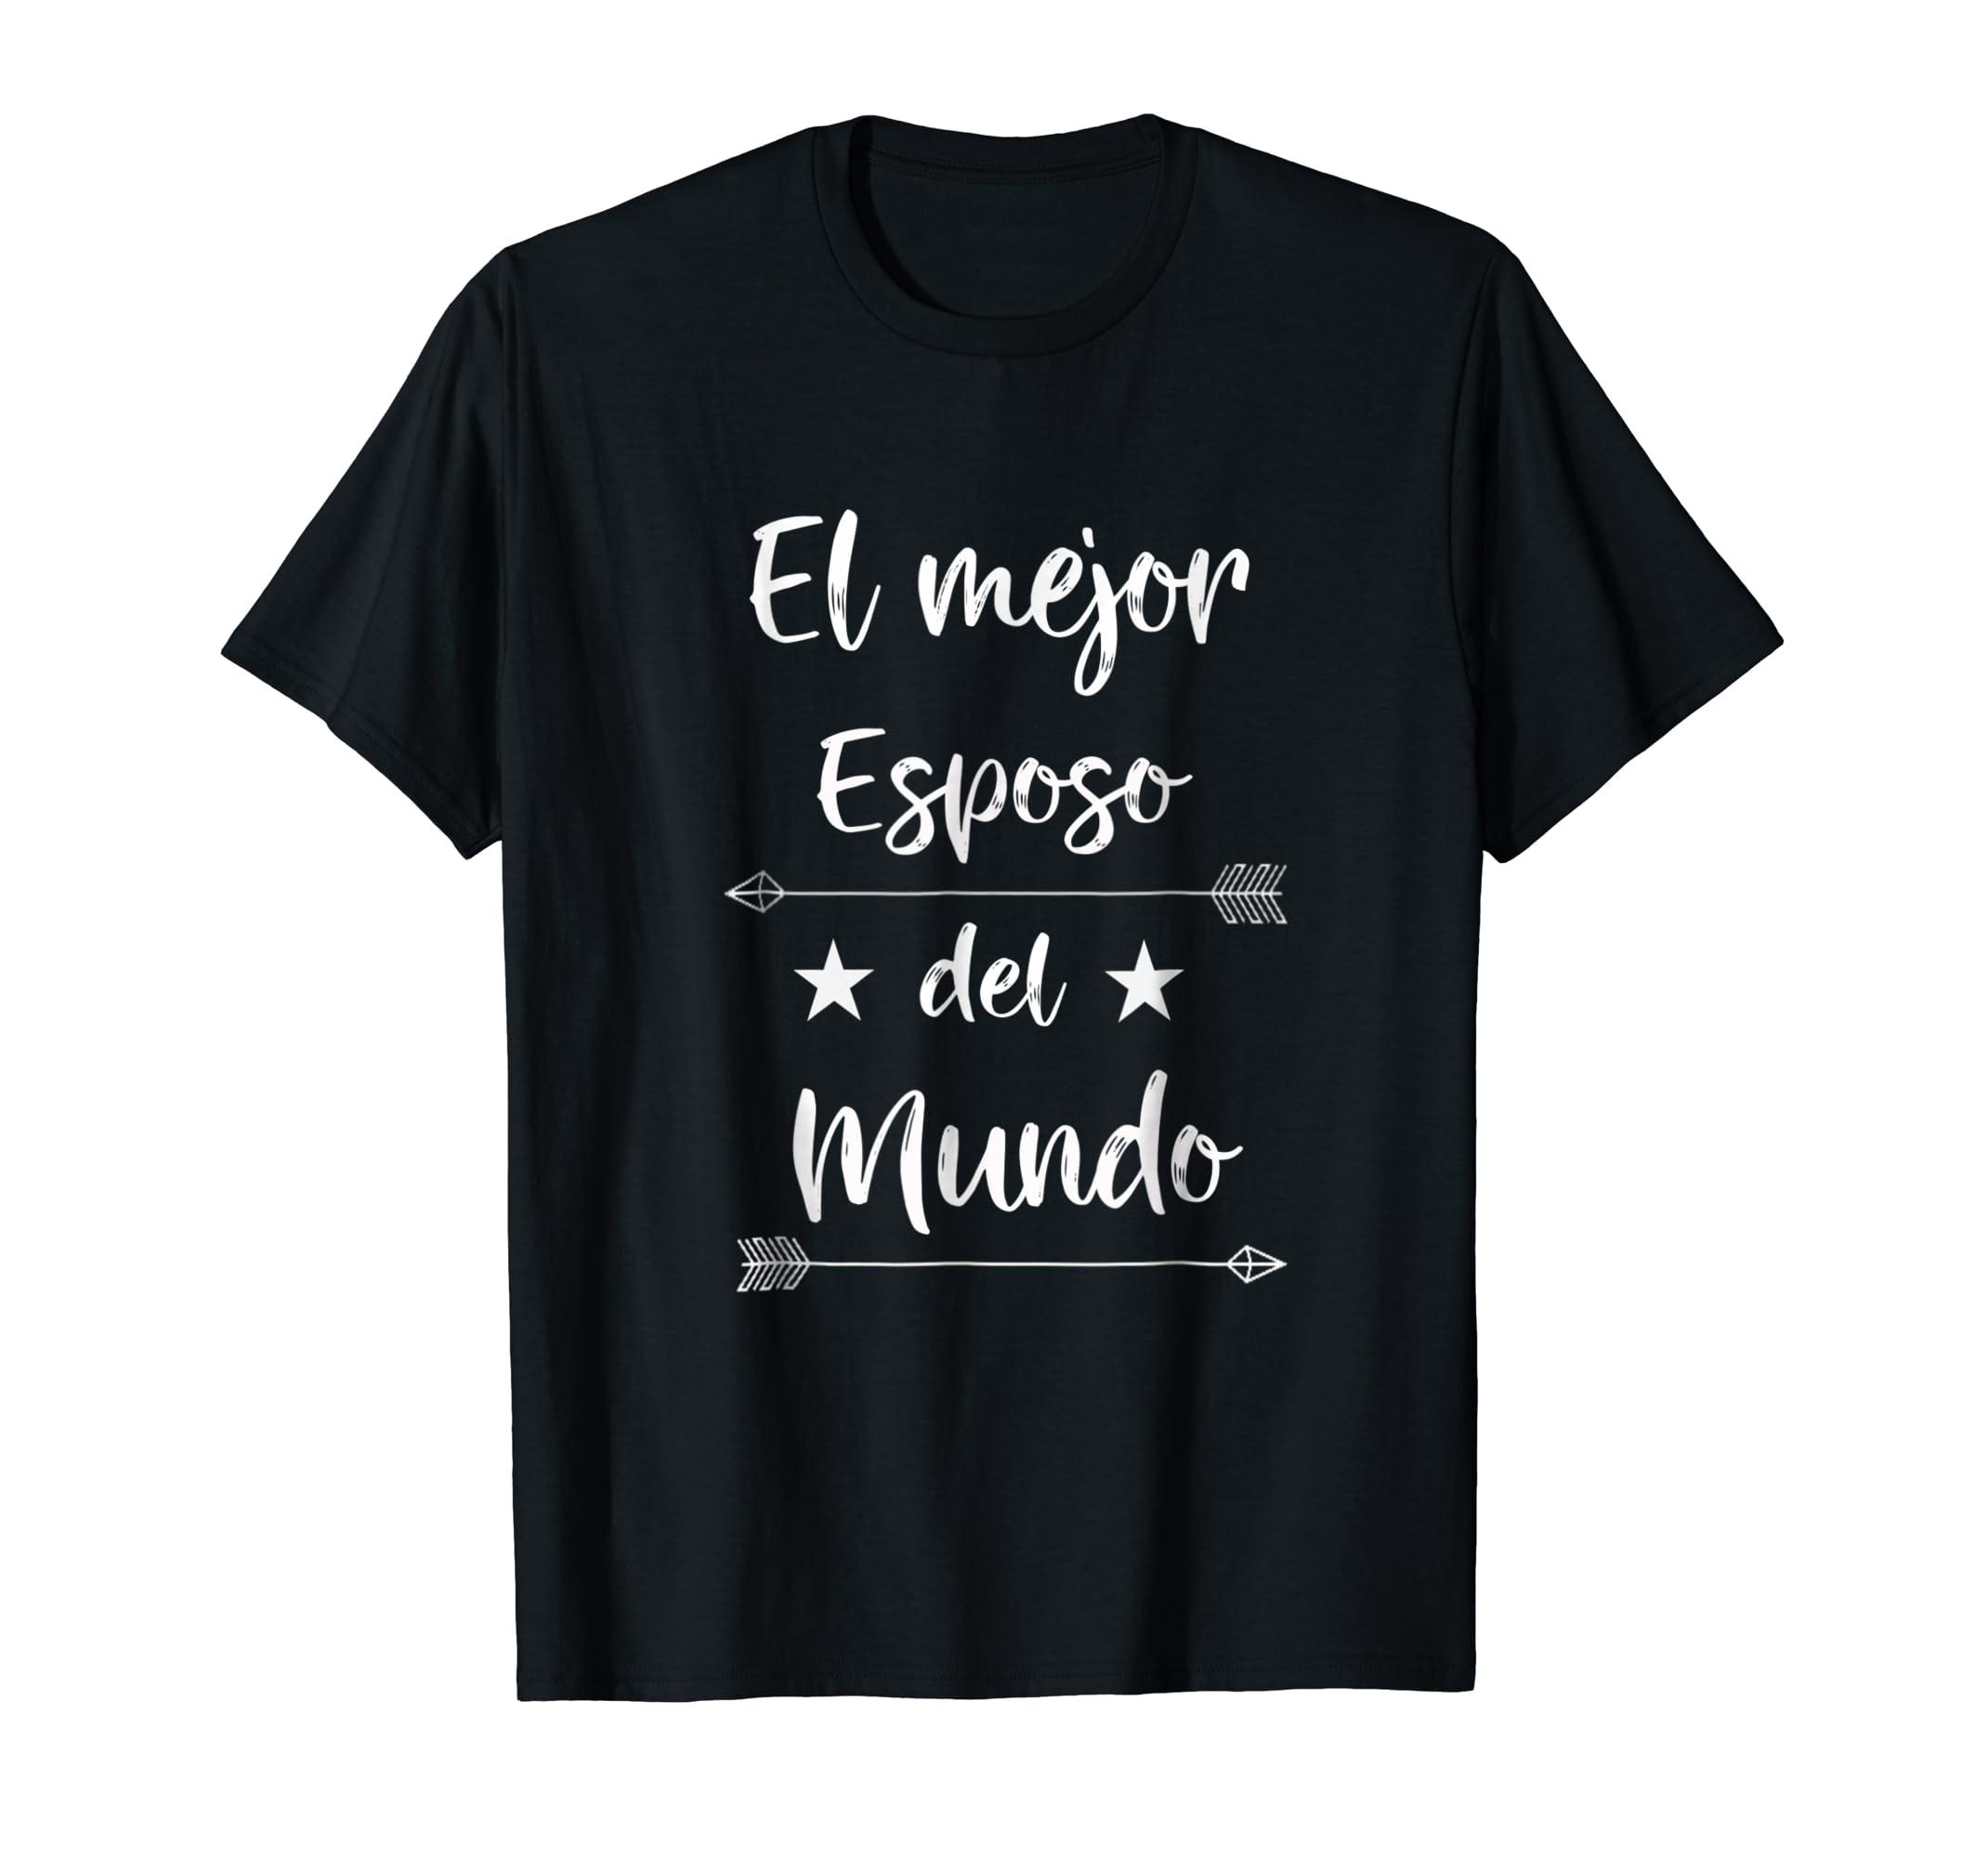 El Mejor Esposo del Mundo Shirt Spanish-Best Husband Tee-Men's T-Shirt-Black